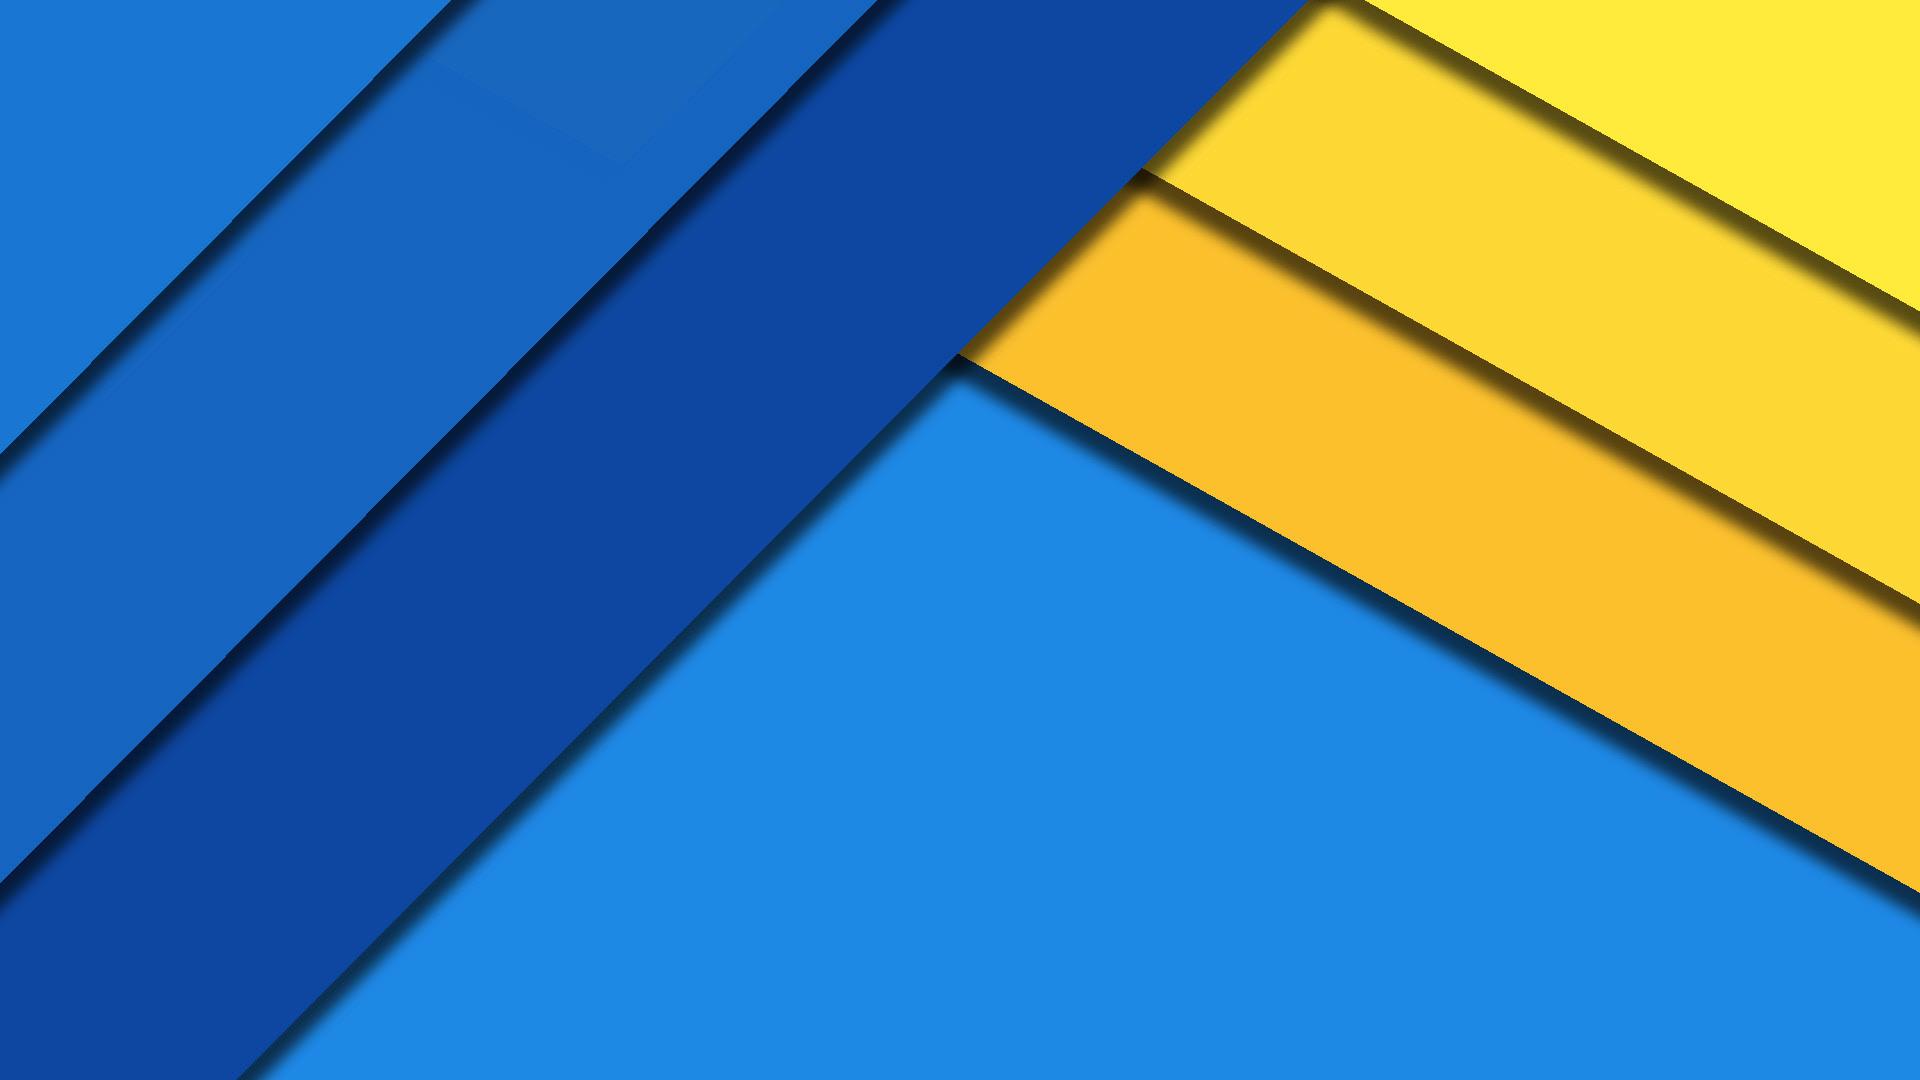 Unduh 630+ Background Blue Yellow Paling Keren